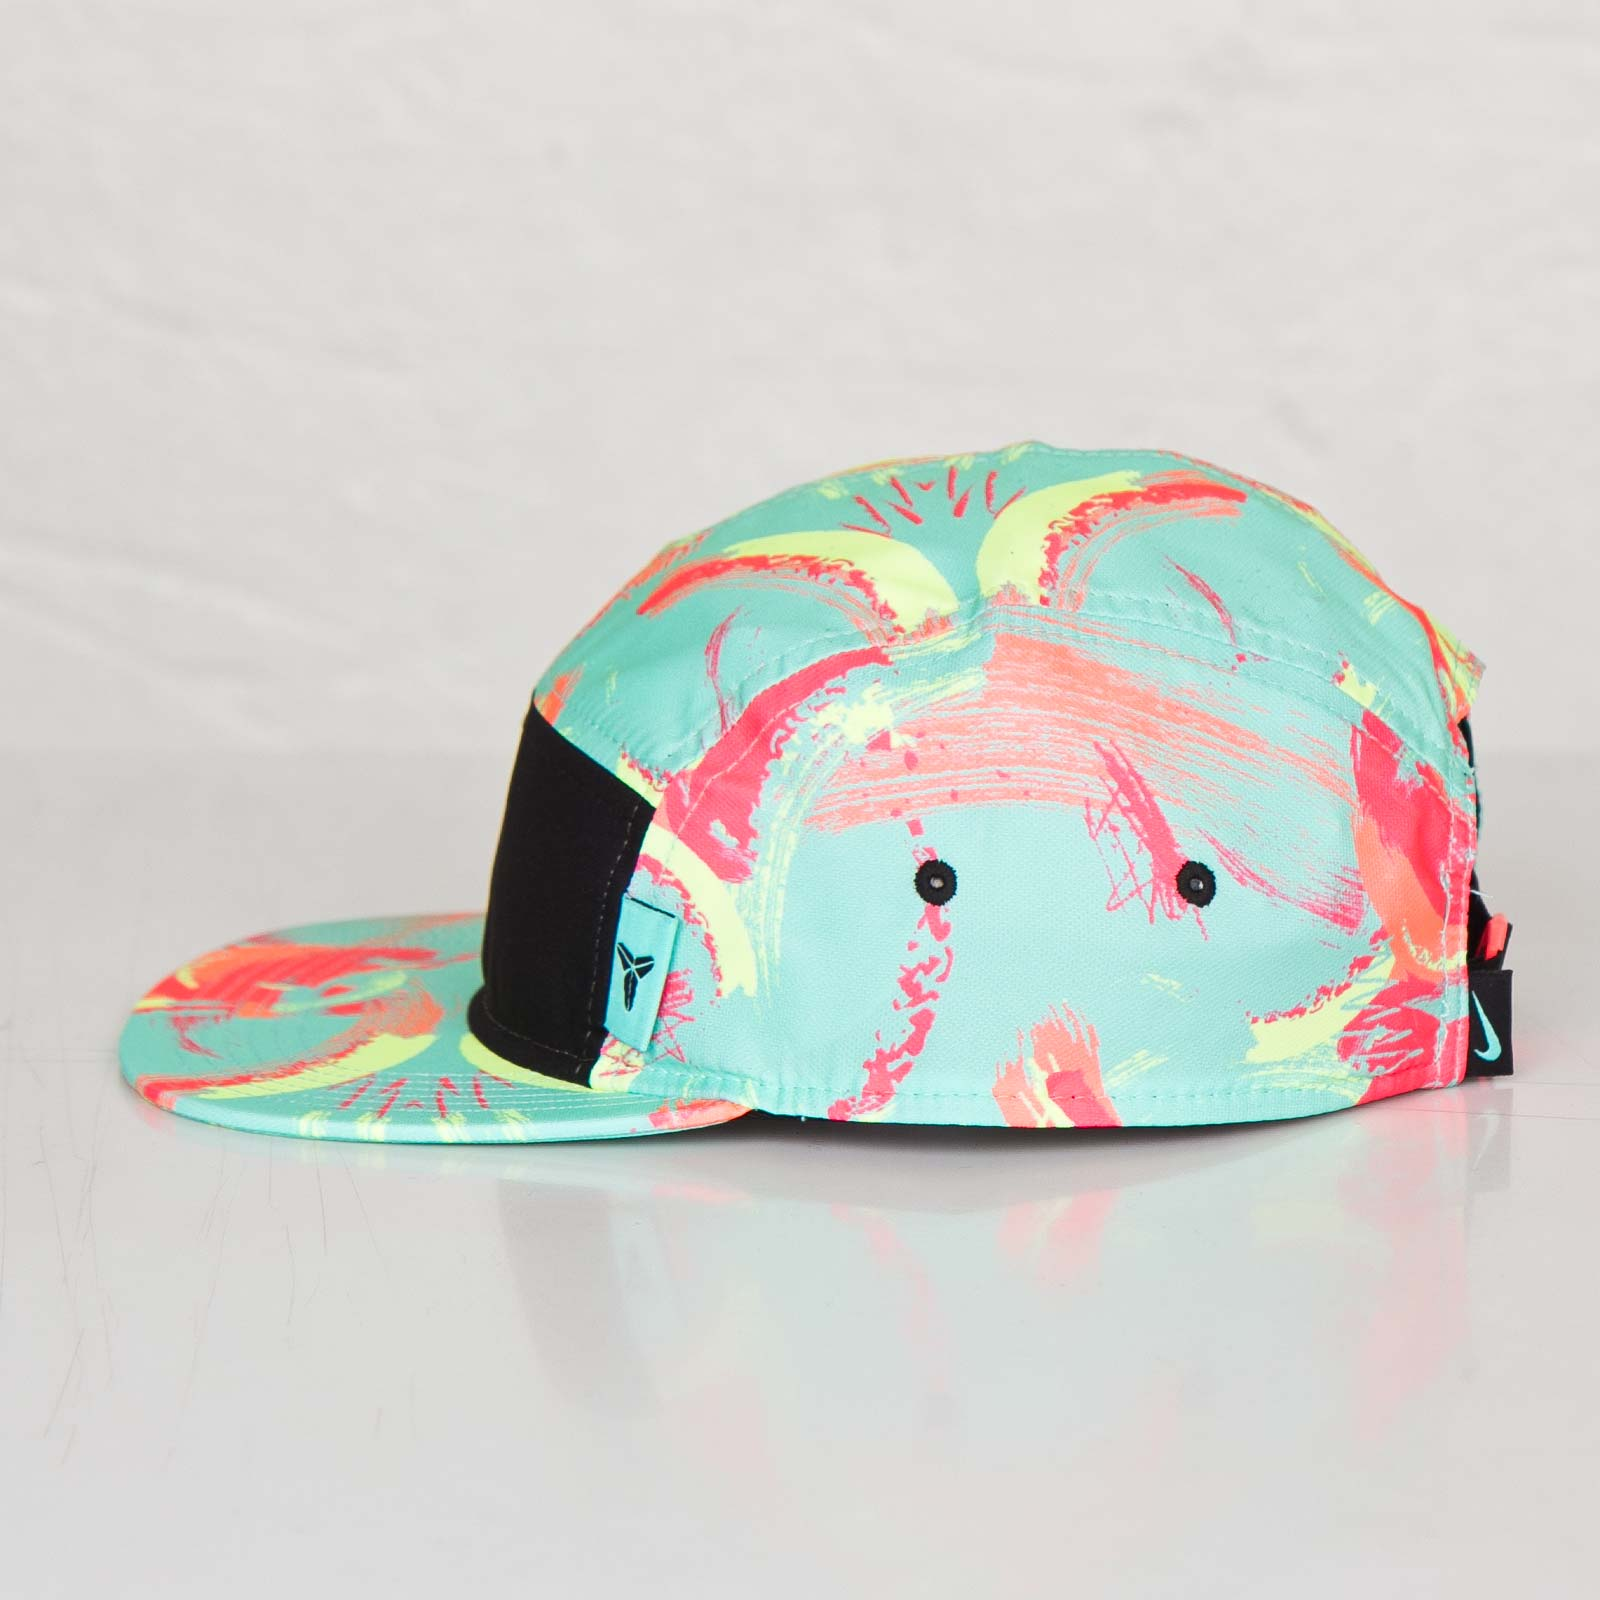 a80541baf24 ... grey nike air max hat cap aw84 dri fit new with tags ref 916350 060  583e9 758cc  buy nike sportswear kobe aw84 easter 411ad 502ab